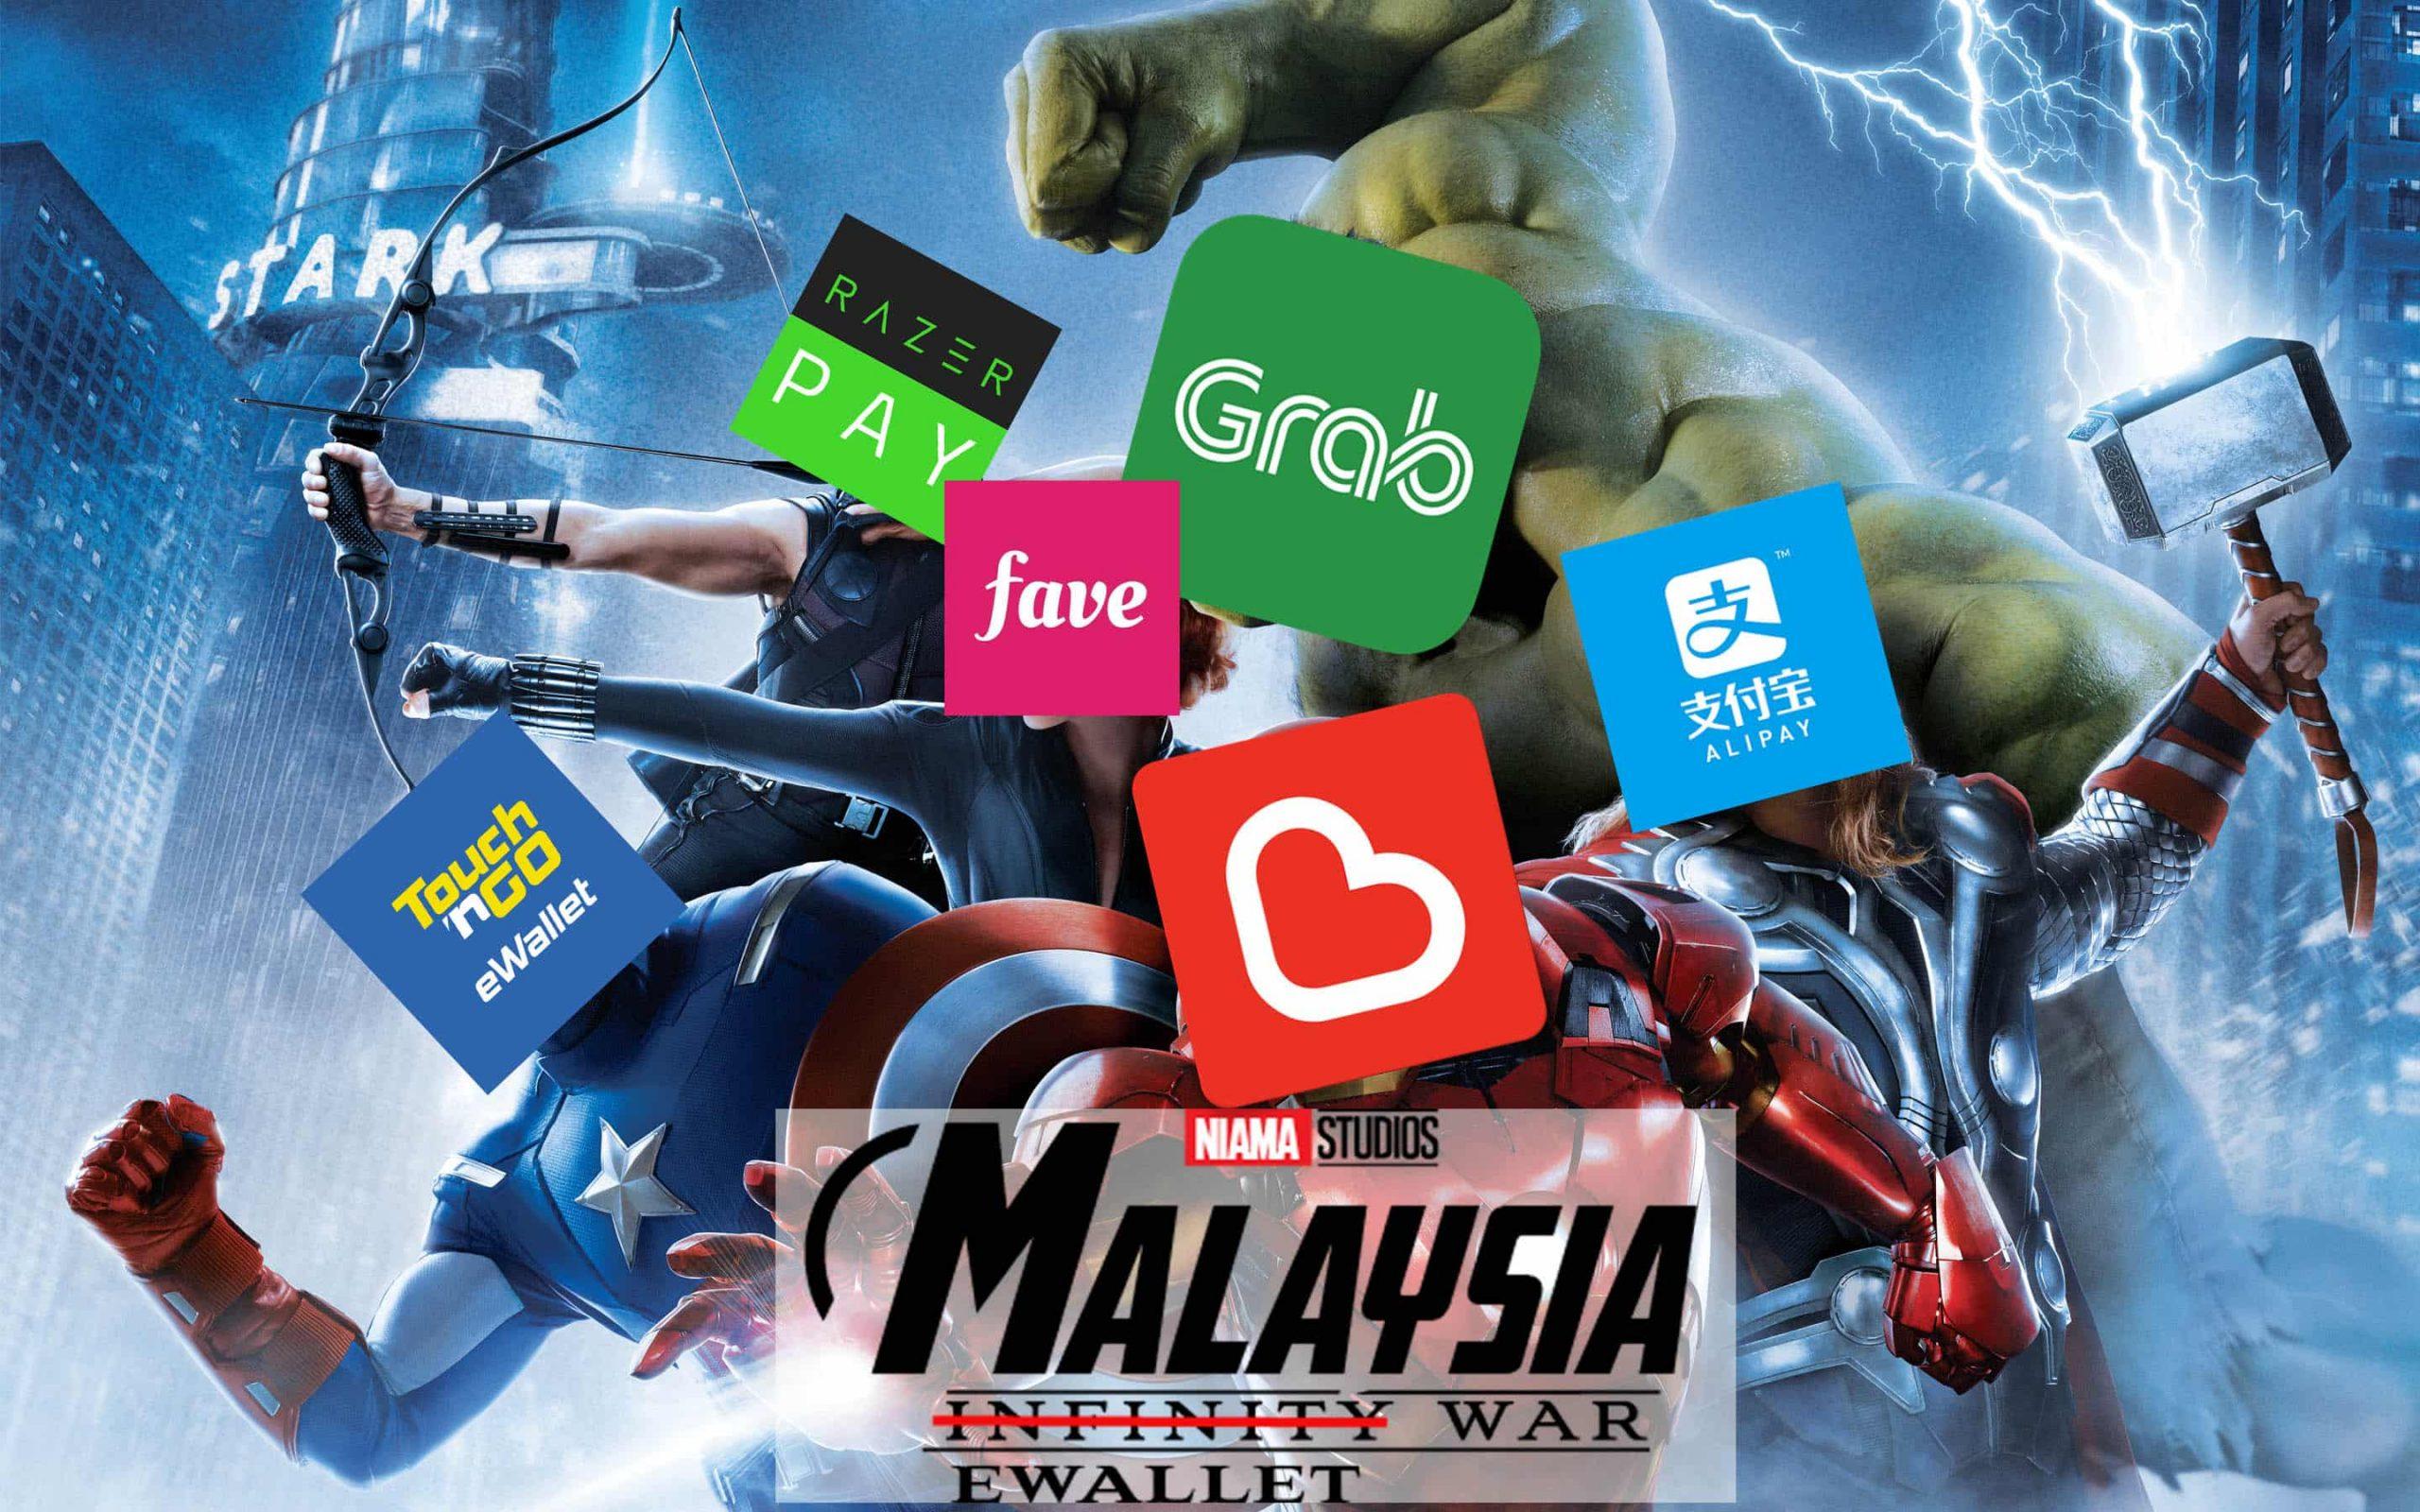 Malaysia eWallet War!